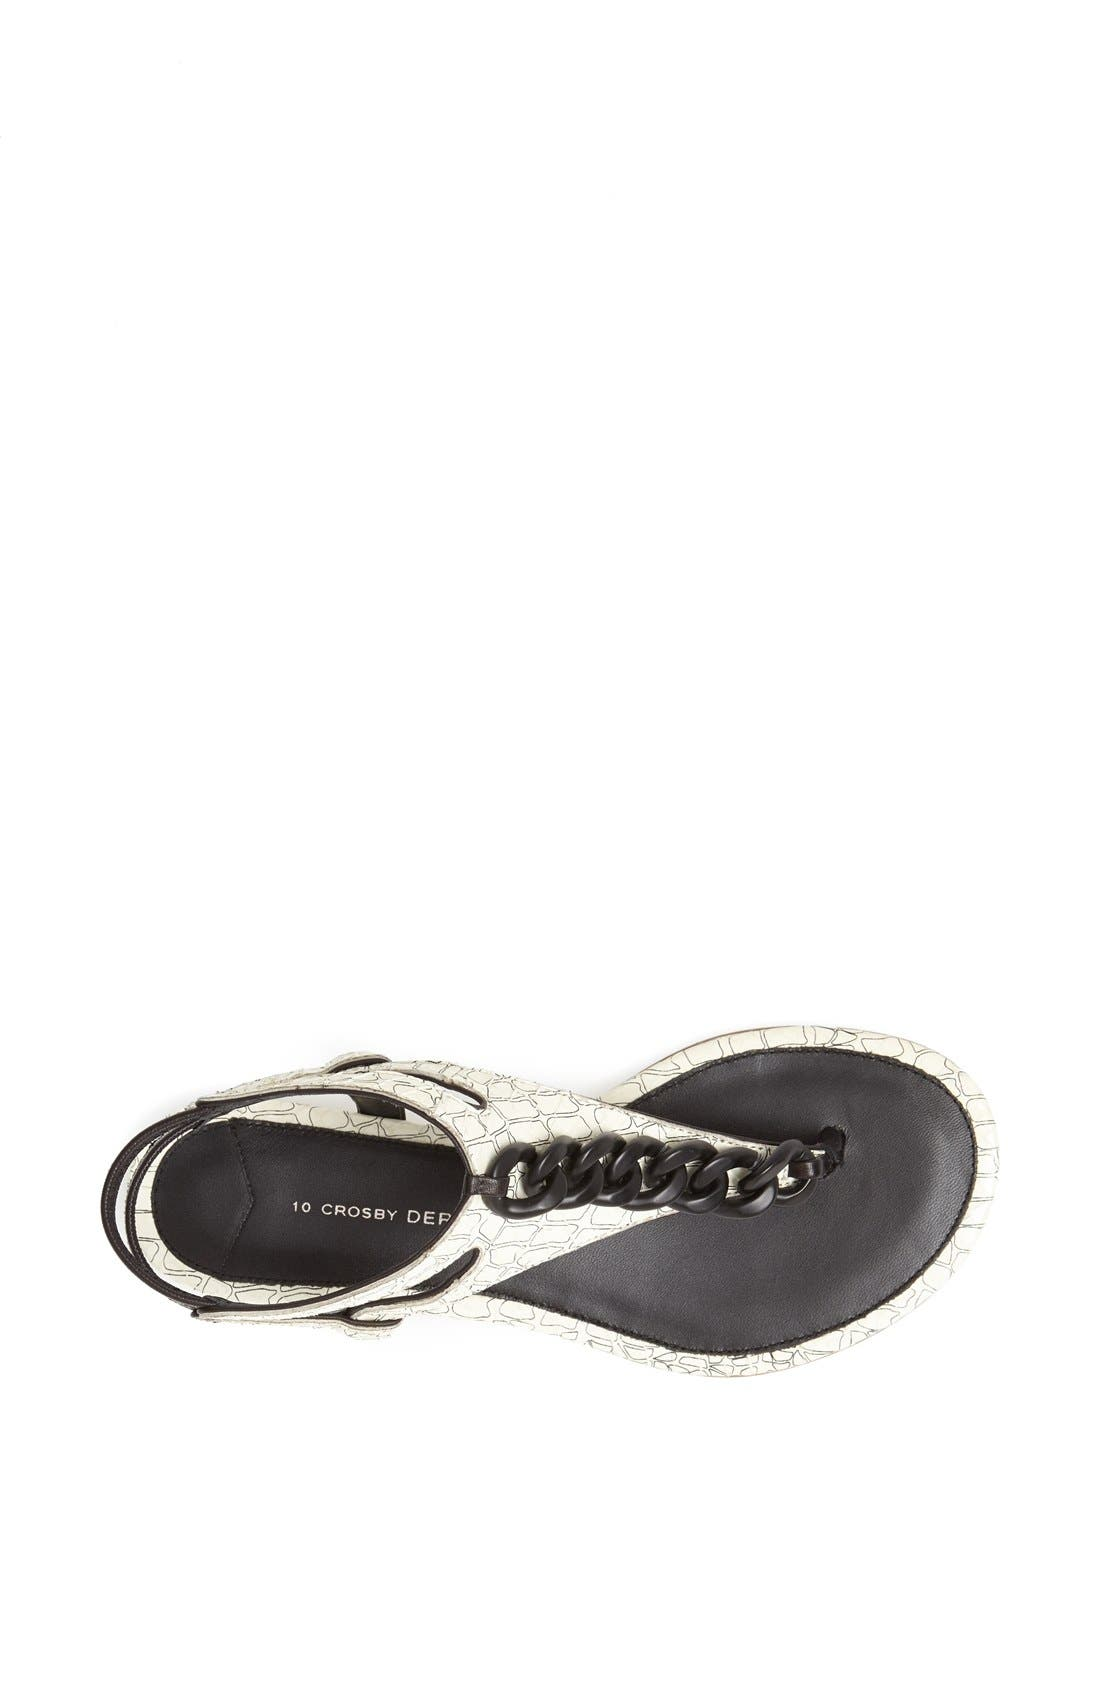 Alternate Image 3  - Derek Lam 10 Crosby 'Damast' Sandal